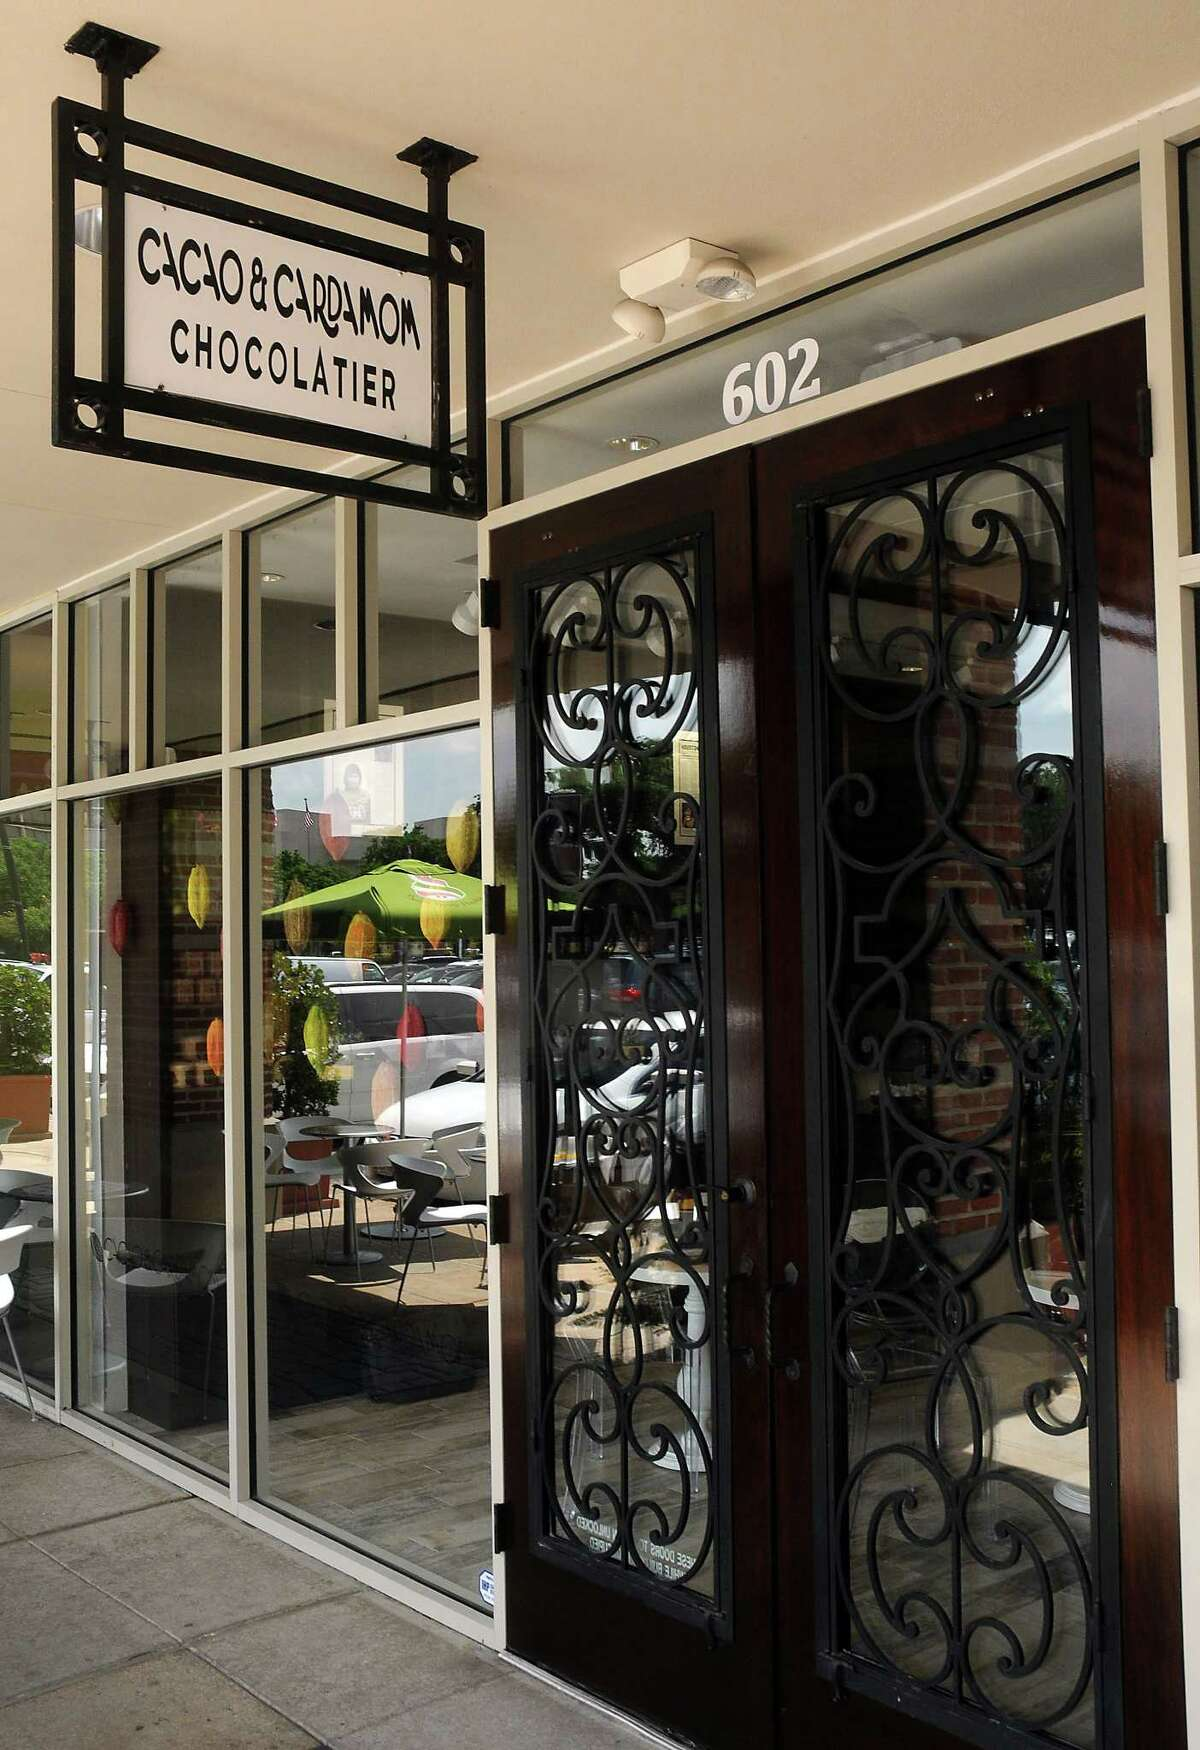 Cacao & Cardamom at 5000 Westheimer Thursday July 03, 2014 (Dave Rossman photo)